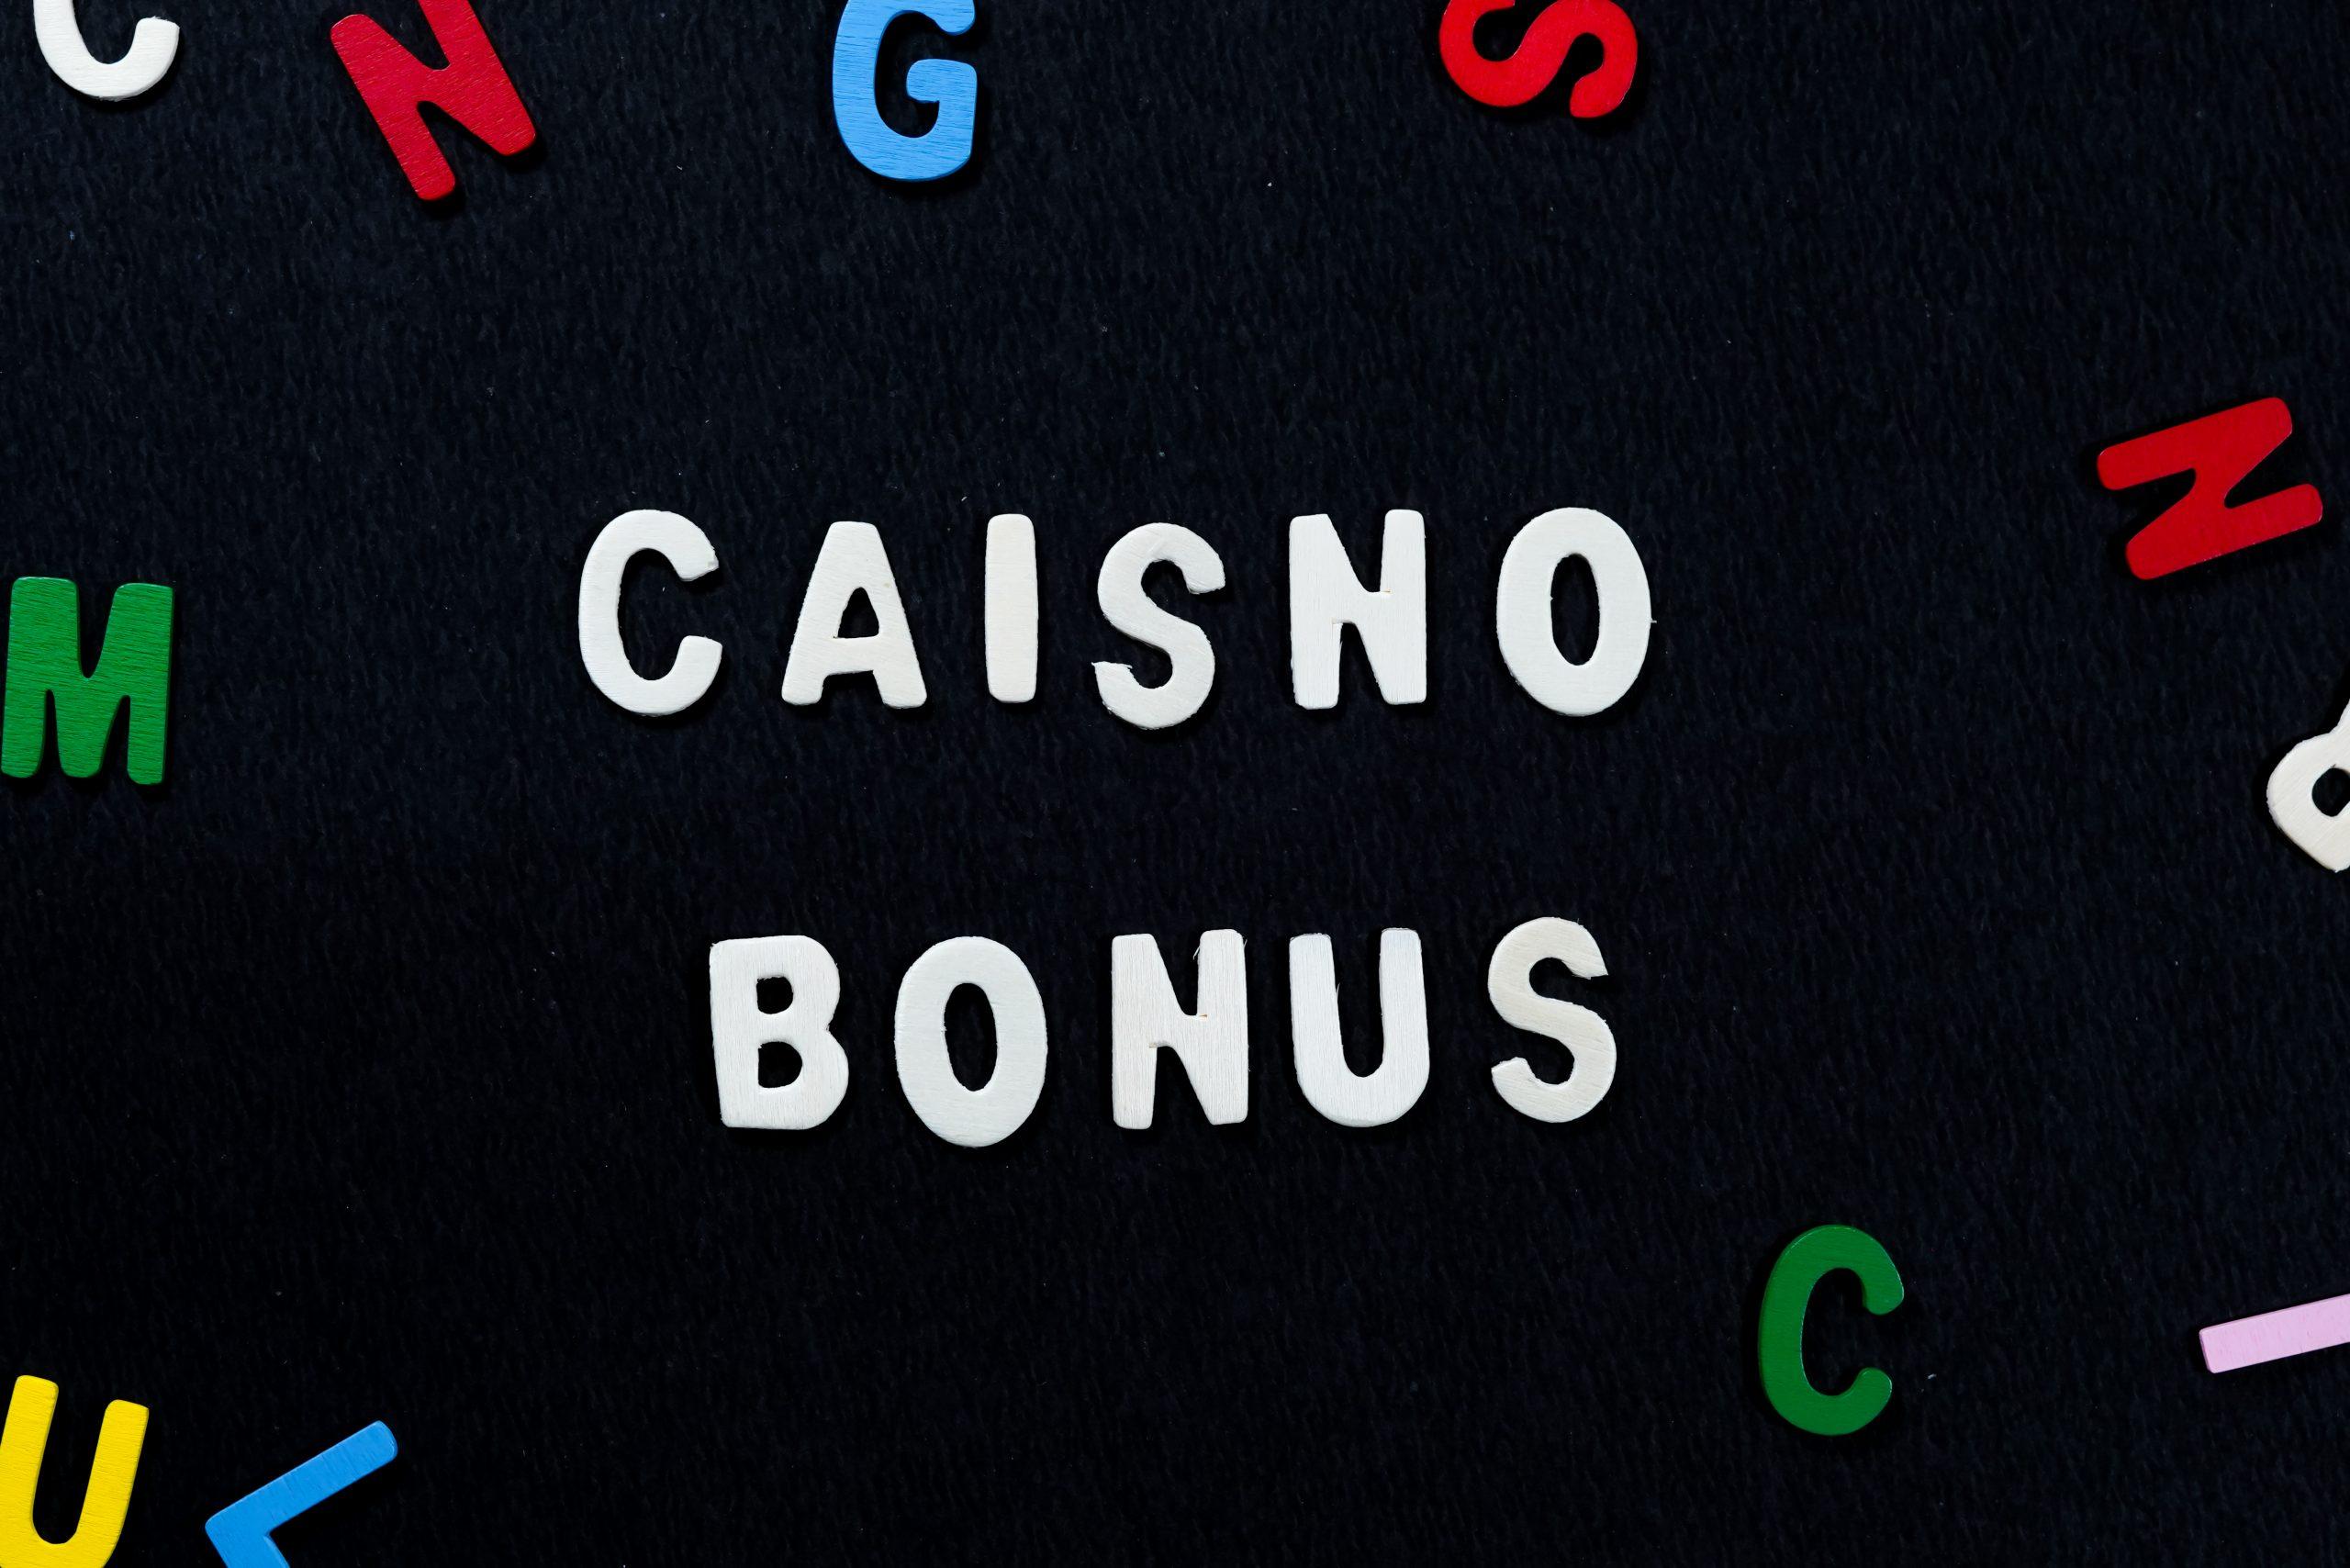 Casino bonus written